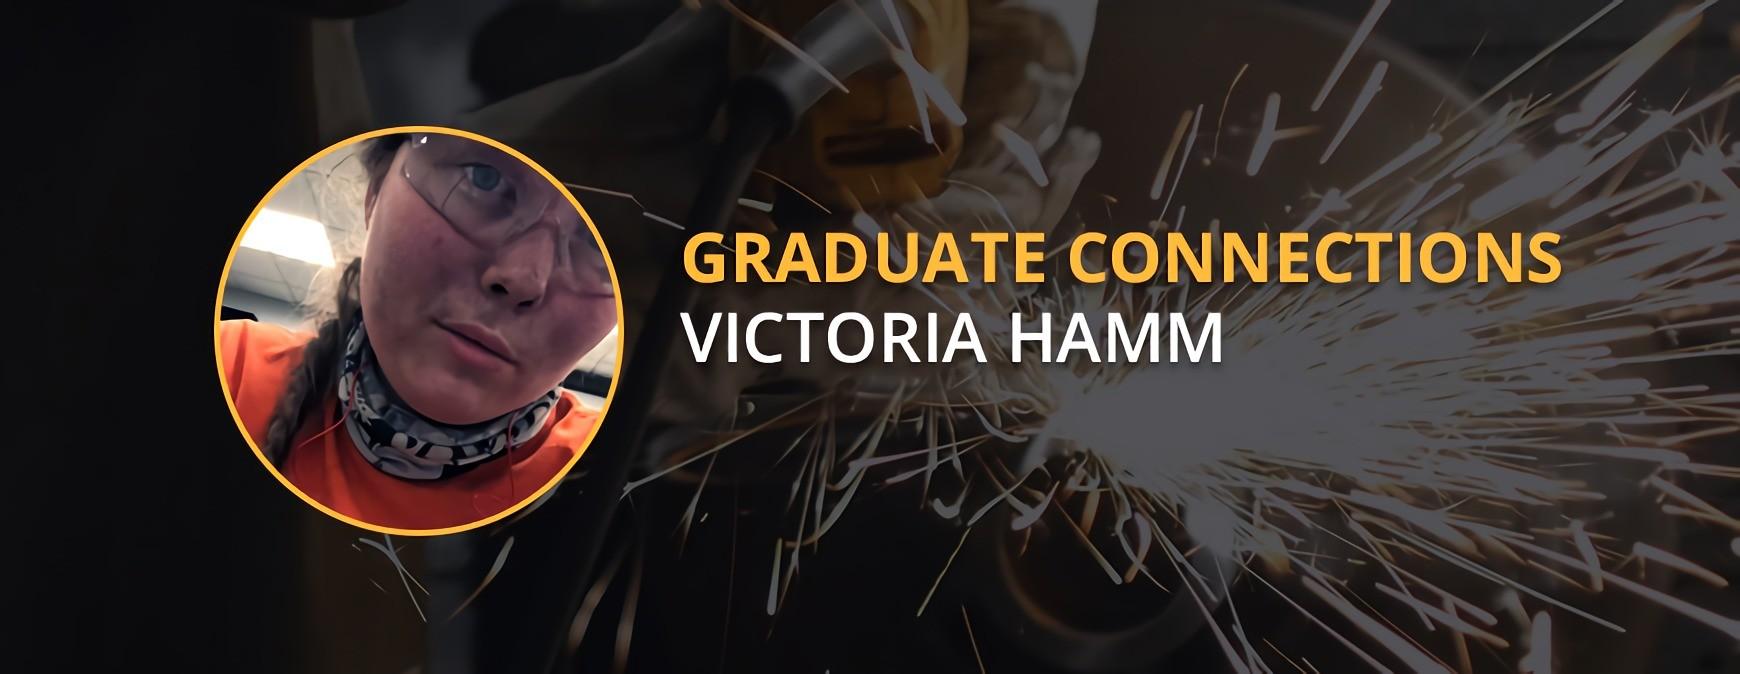 Victoria Hamm Graduate Connection